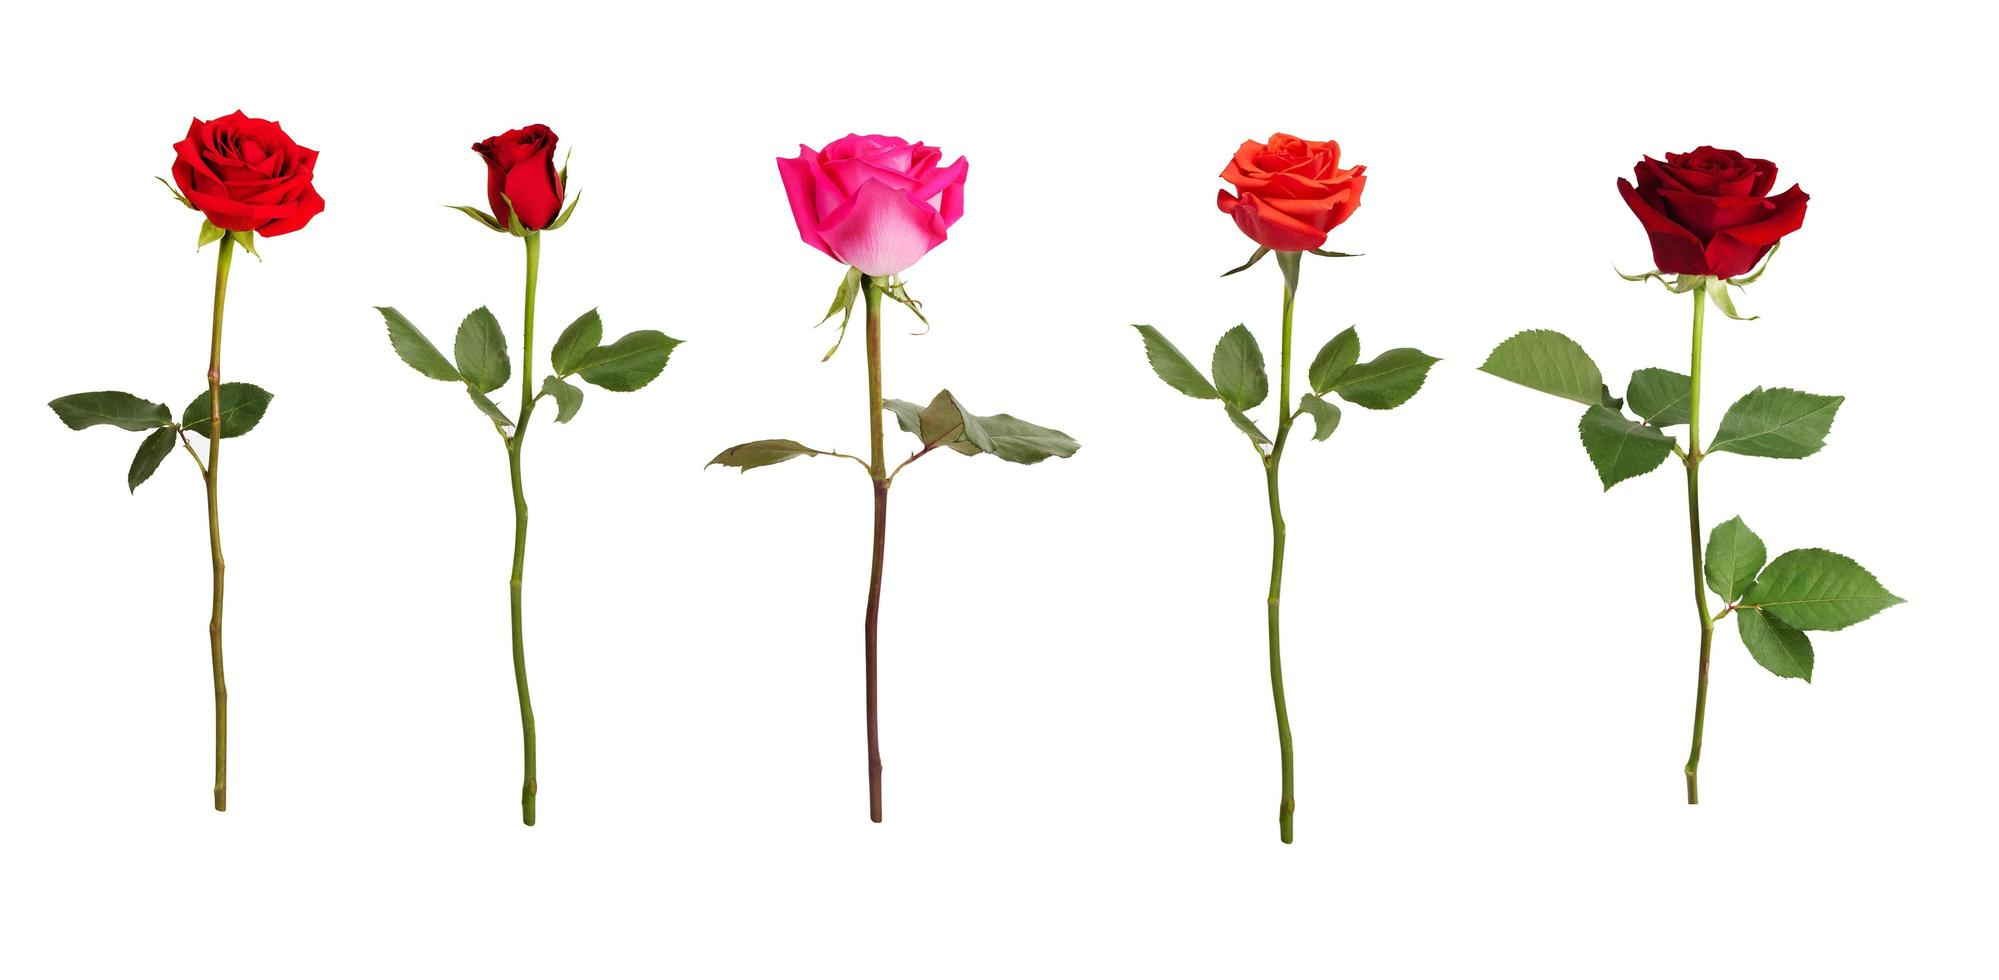 cinco rosas de diferentes colores foto